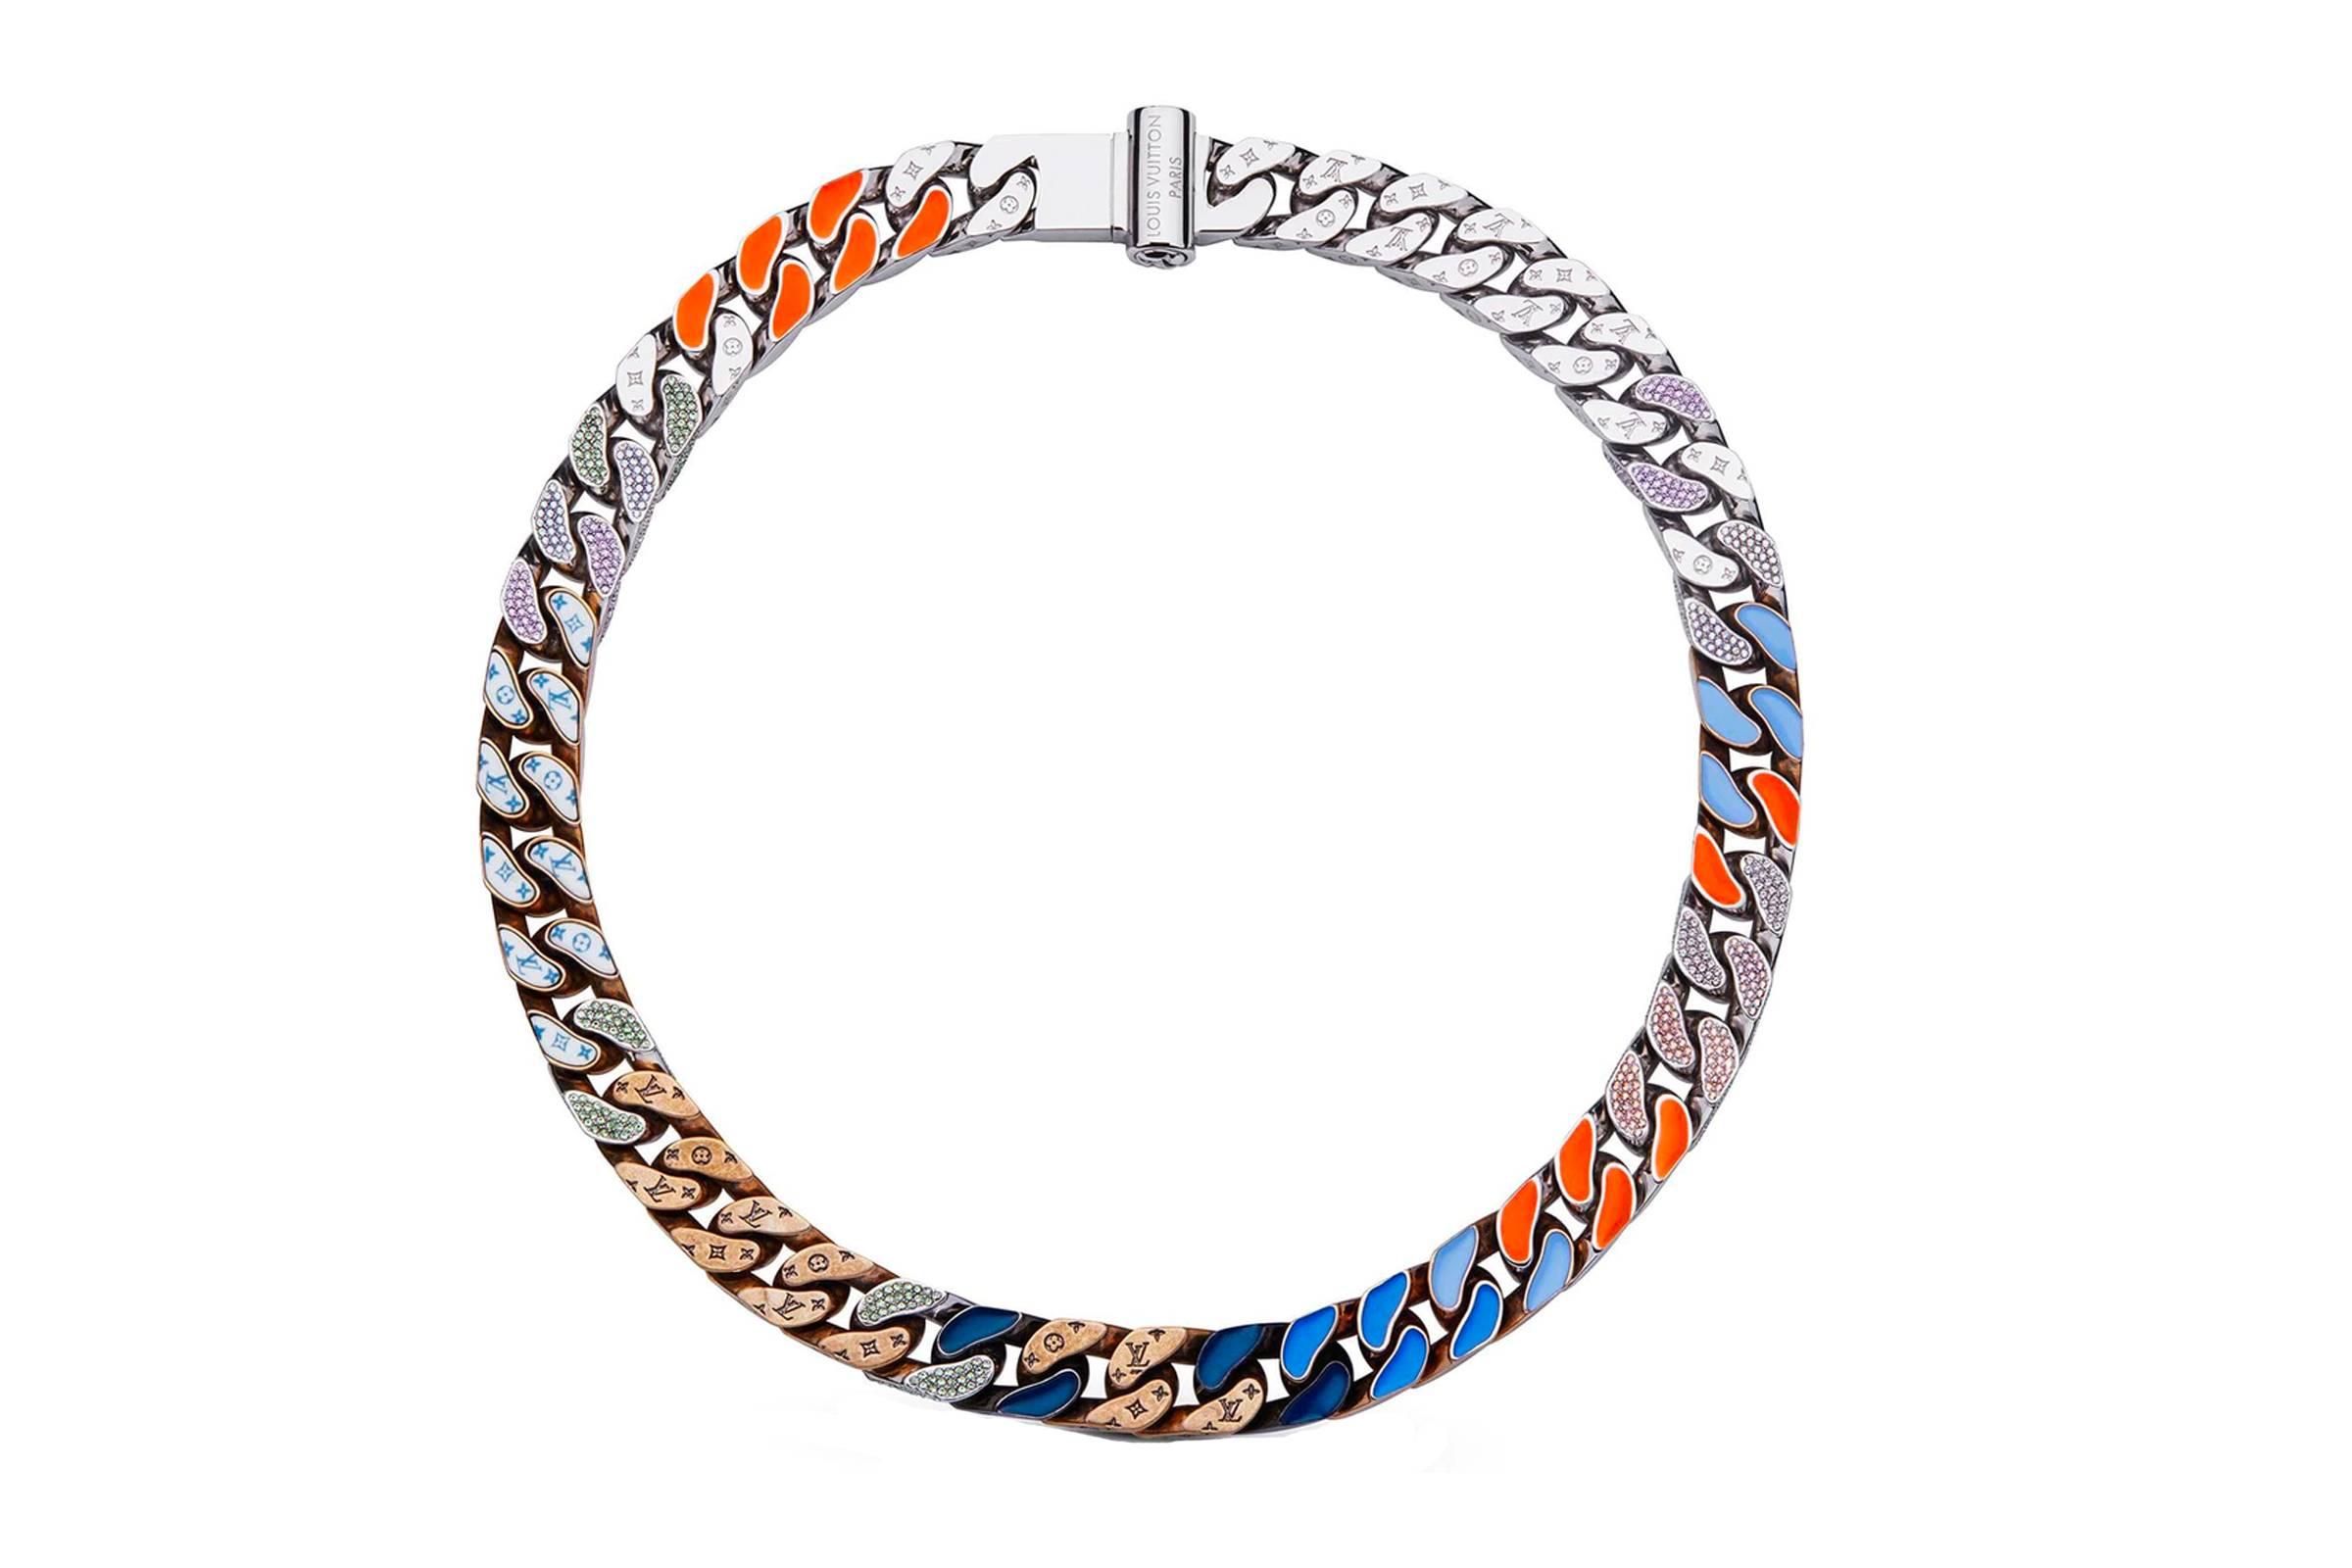 Louis Vuitton Chains Links Patches Necklace